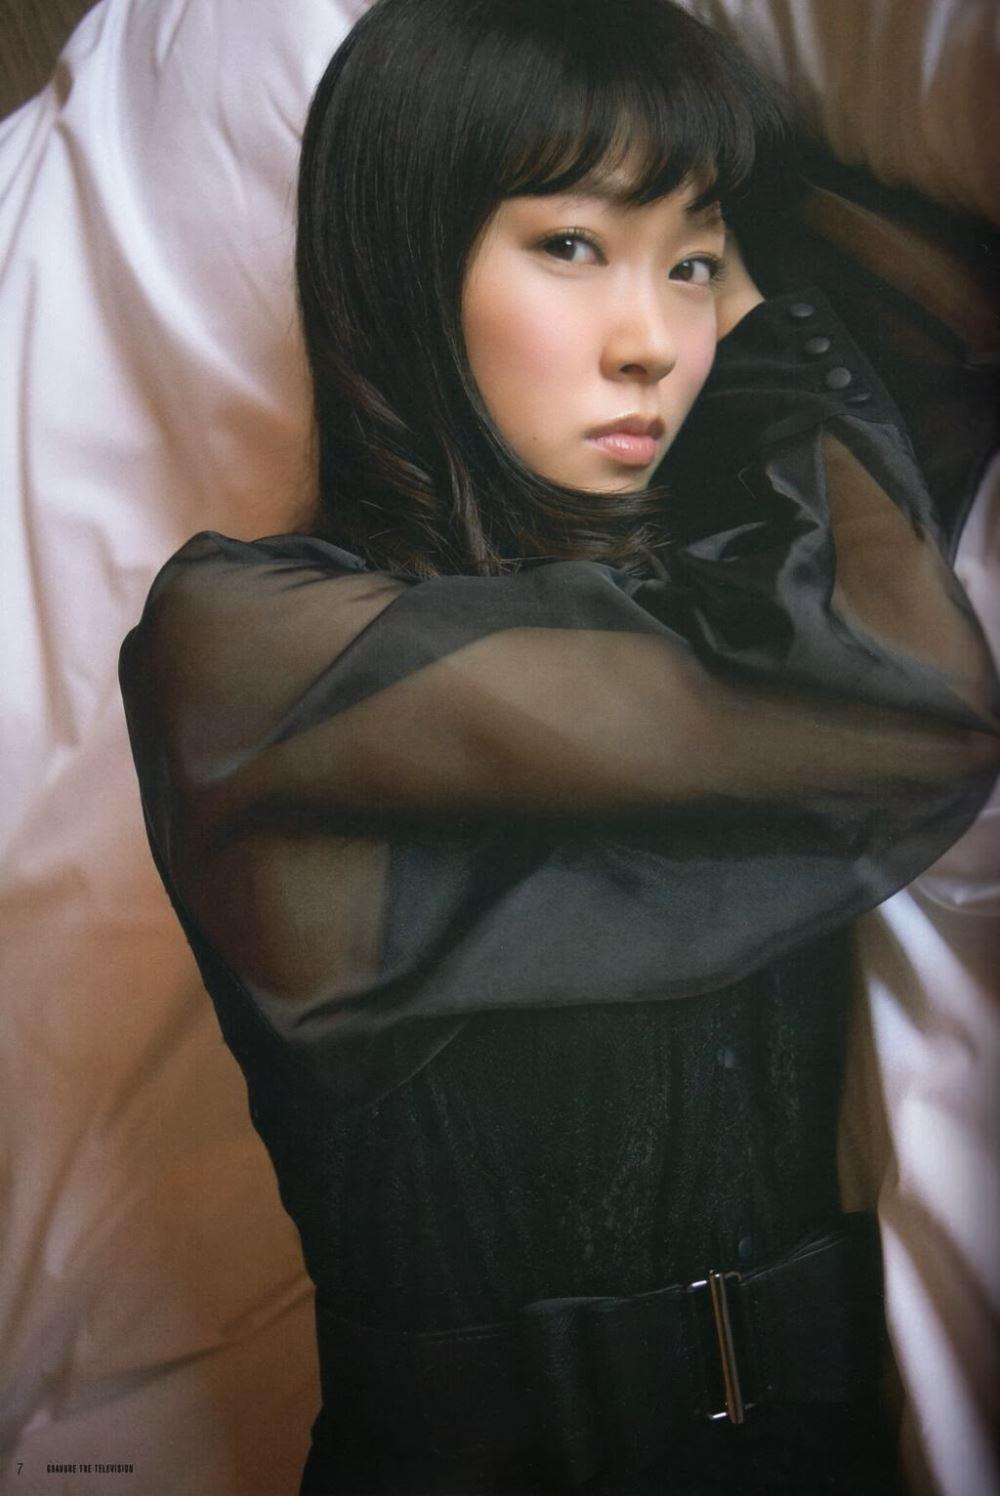 渡辺美優紀 エロ画像 23